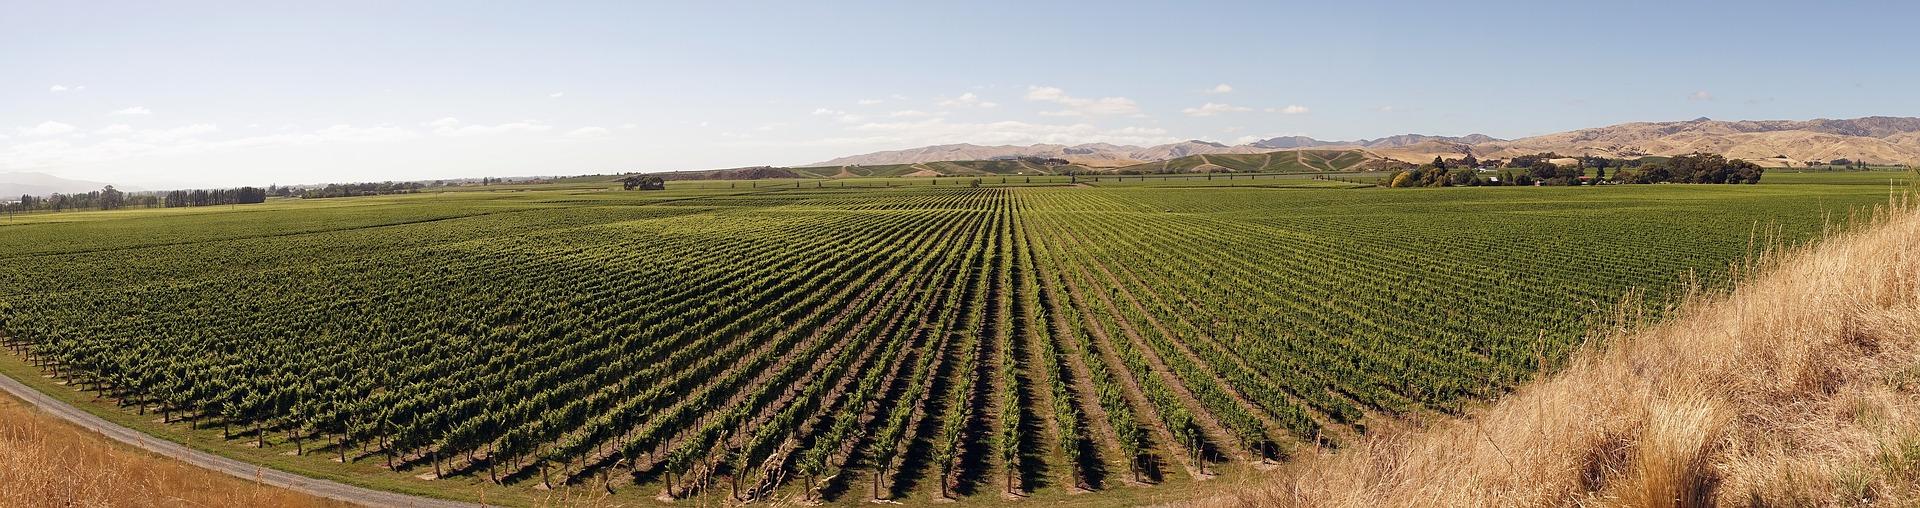 winegrowing-2151457_1920